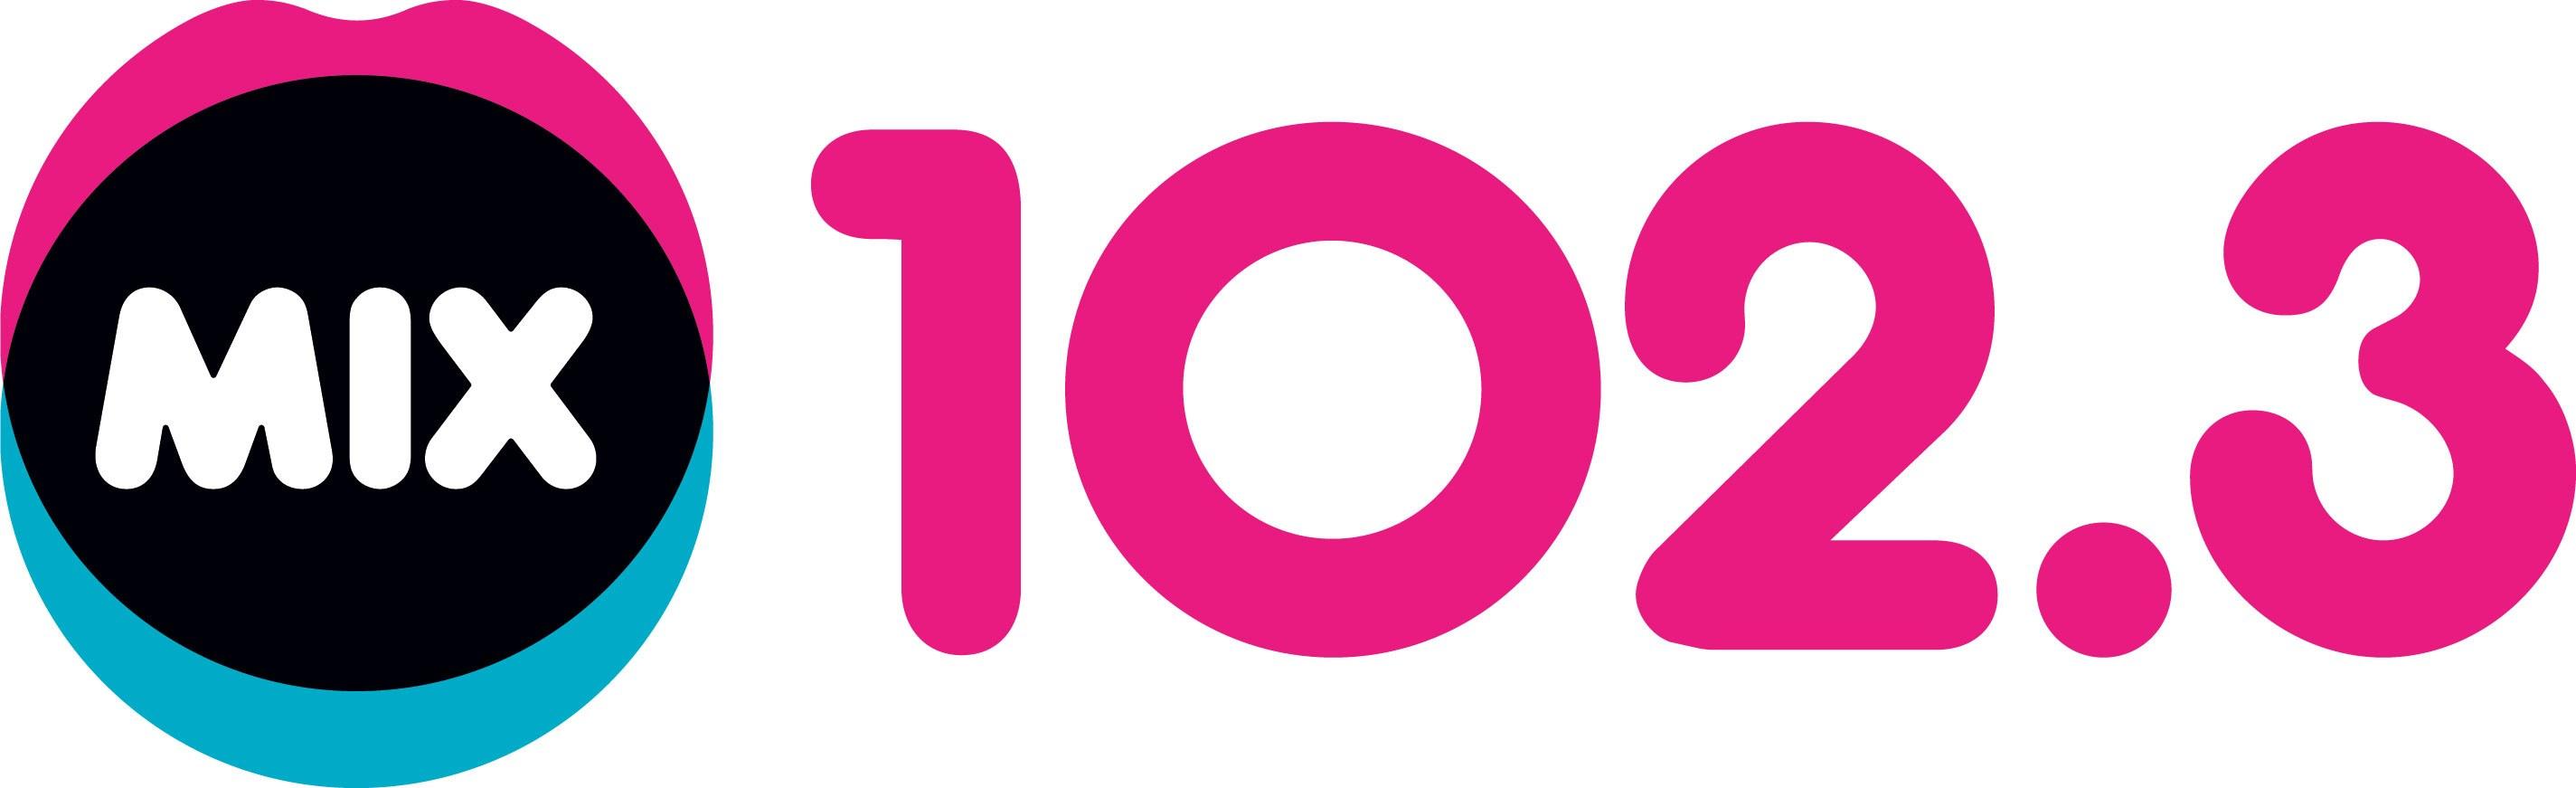 Mix102